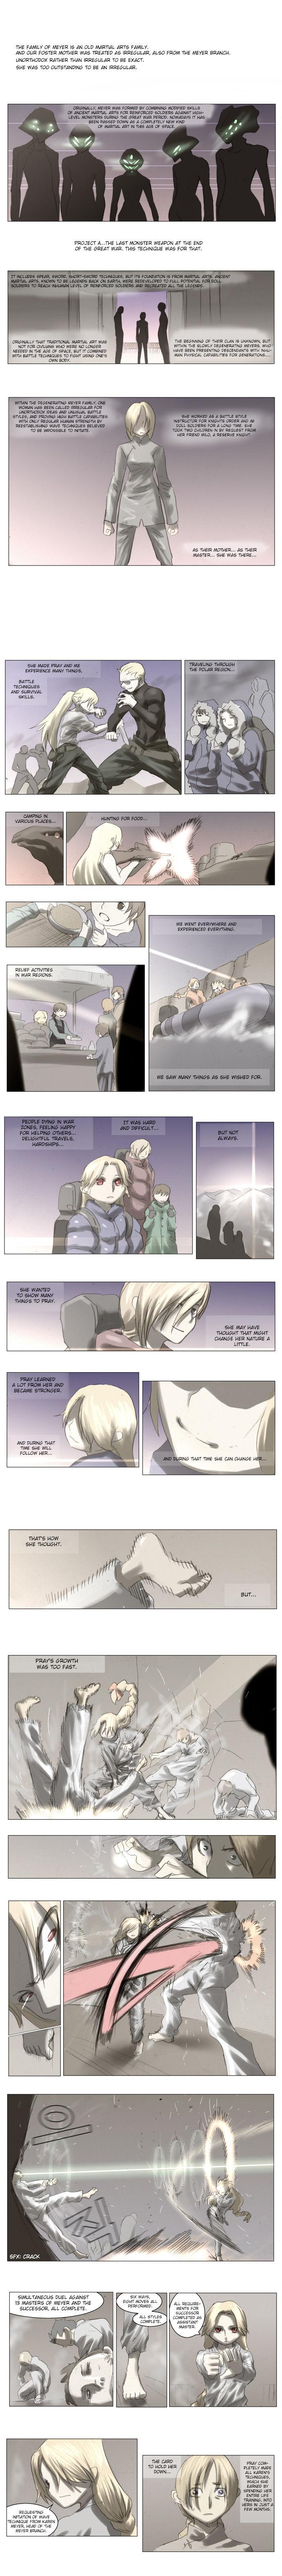 Knight Run 49 Page 2